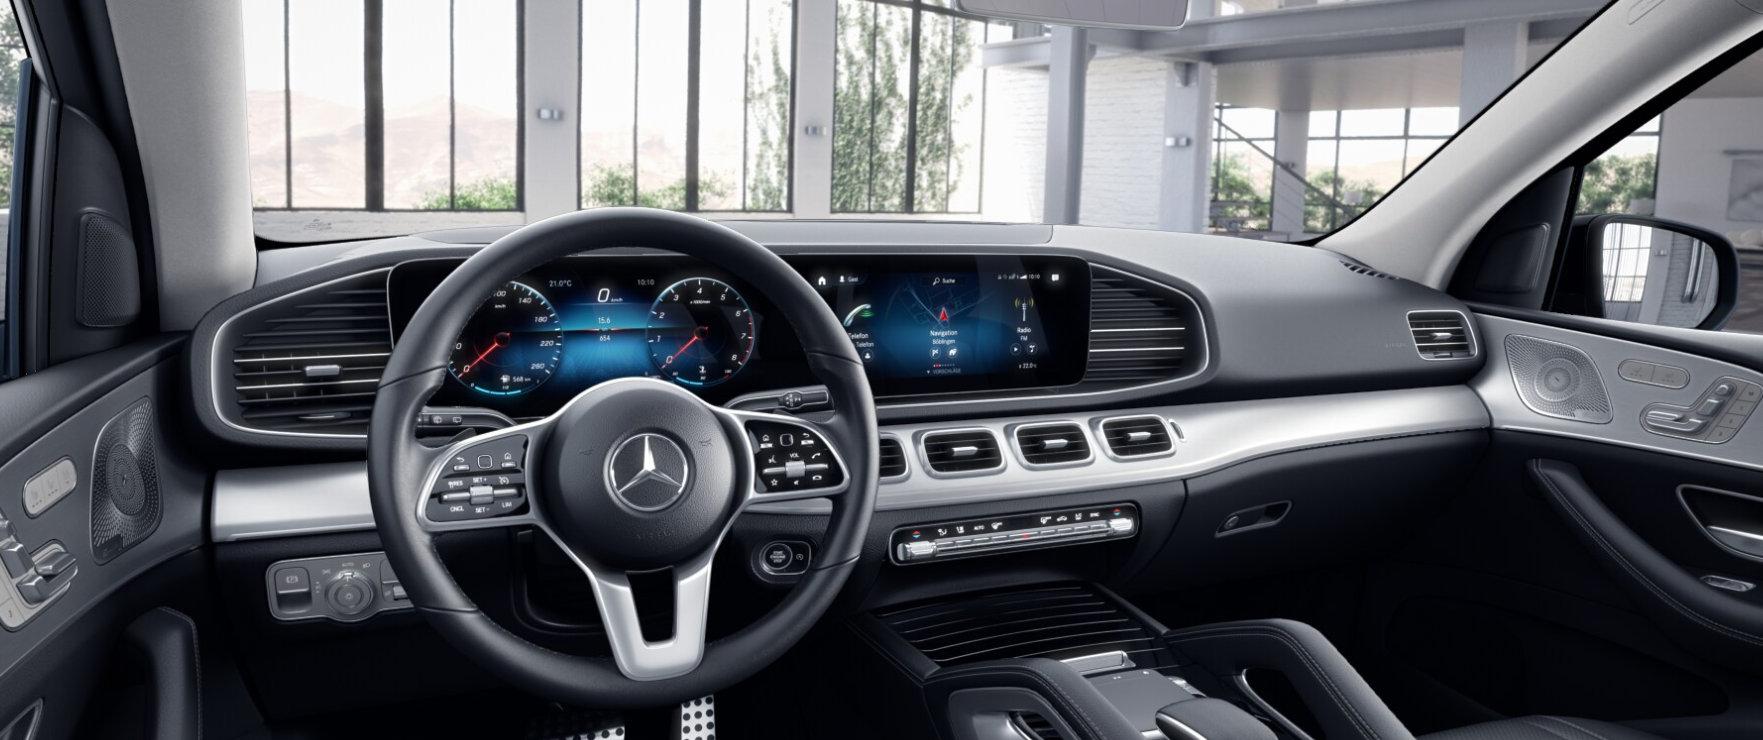 Mercedes-Benz-GLE-leasen-4